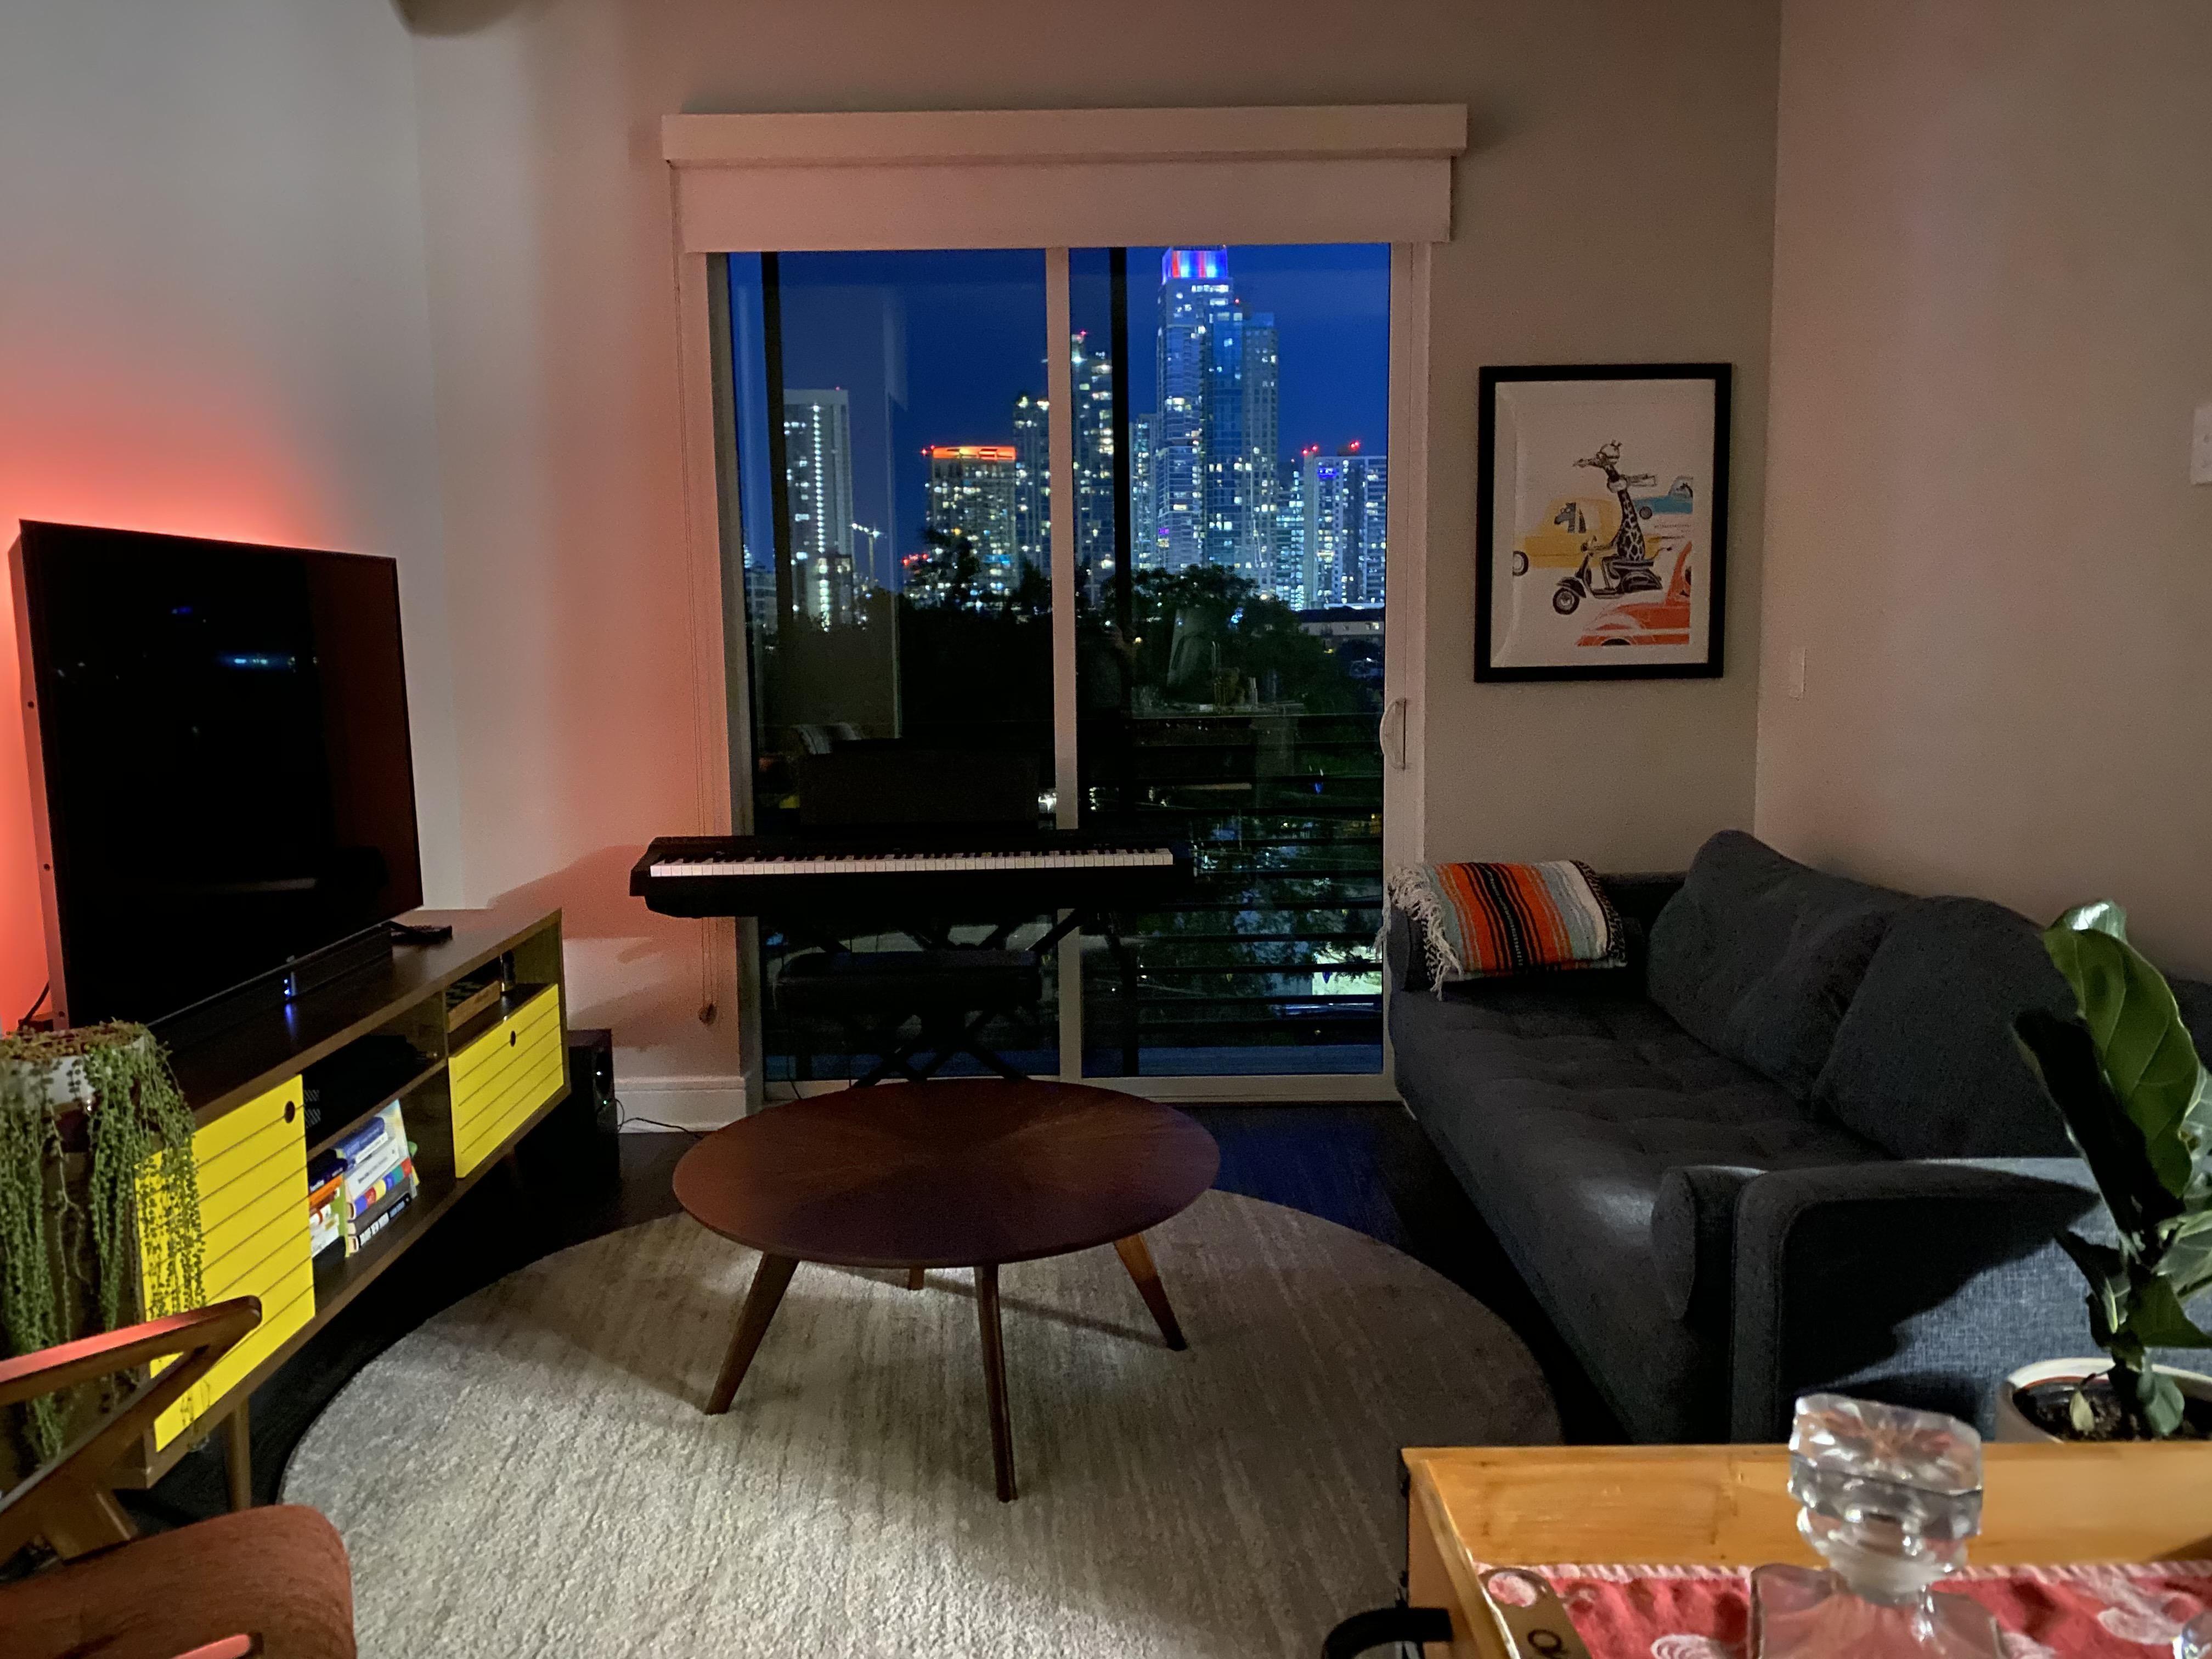 Pin On House Aesthetics Inspire me home decor living room gif